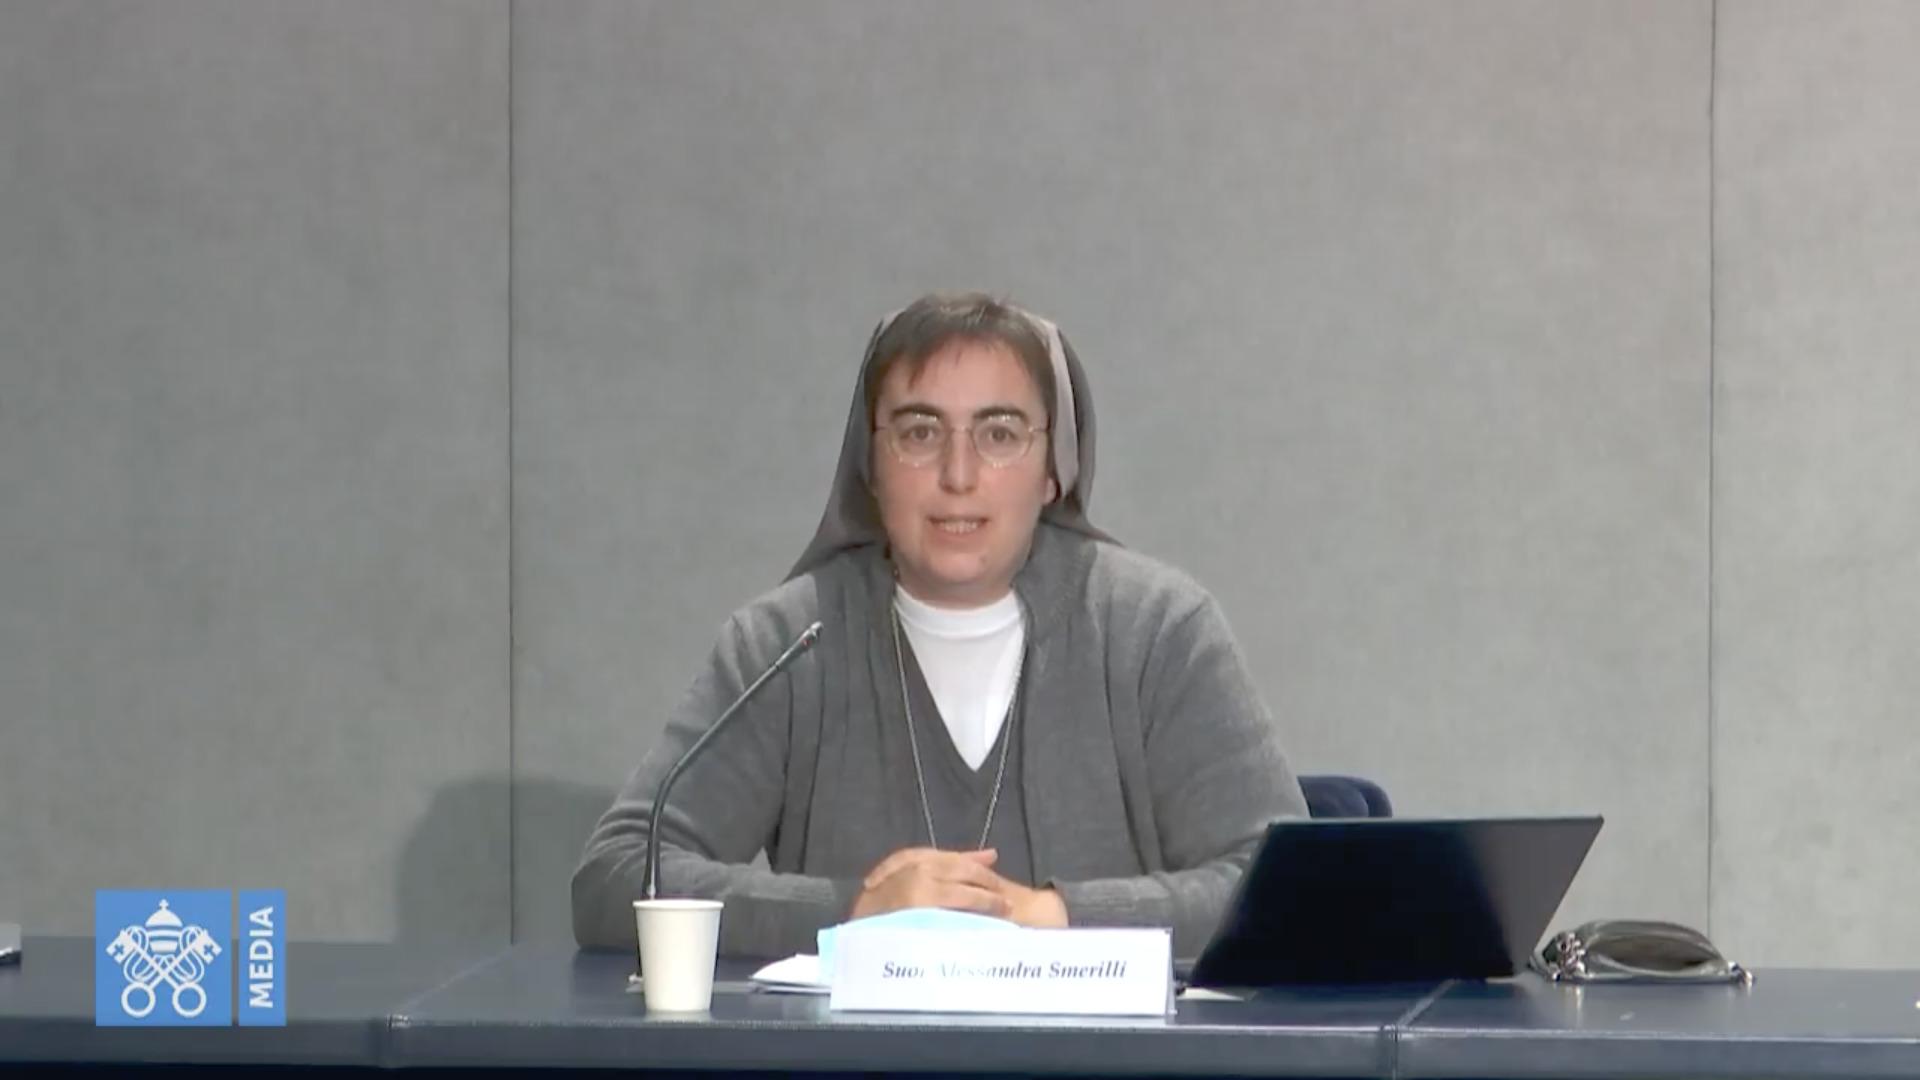 Sr Alessandra Smerilli, capture @ Vatican Media